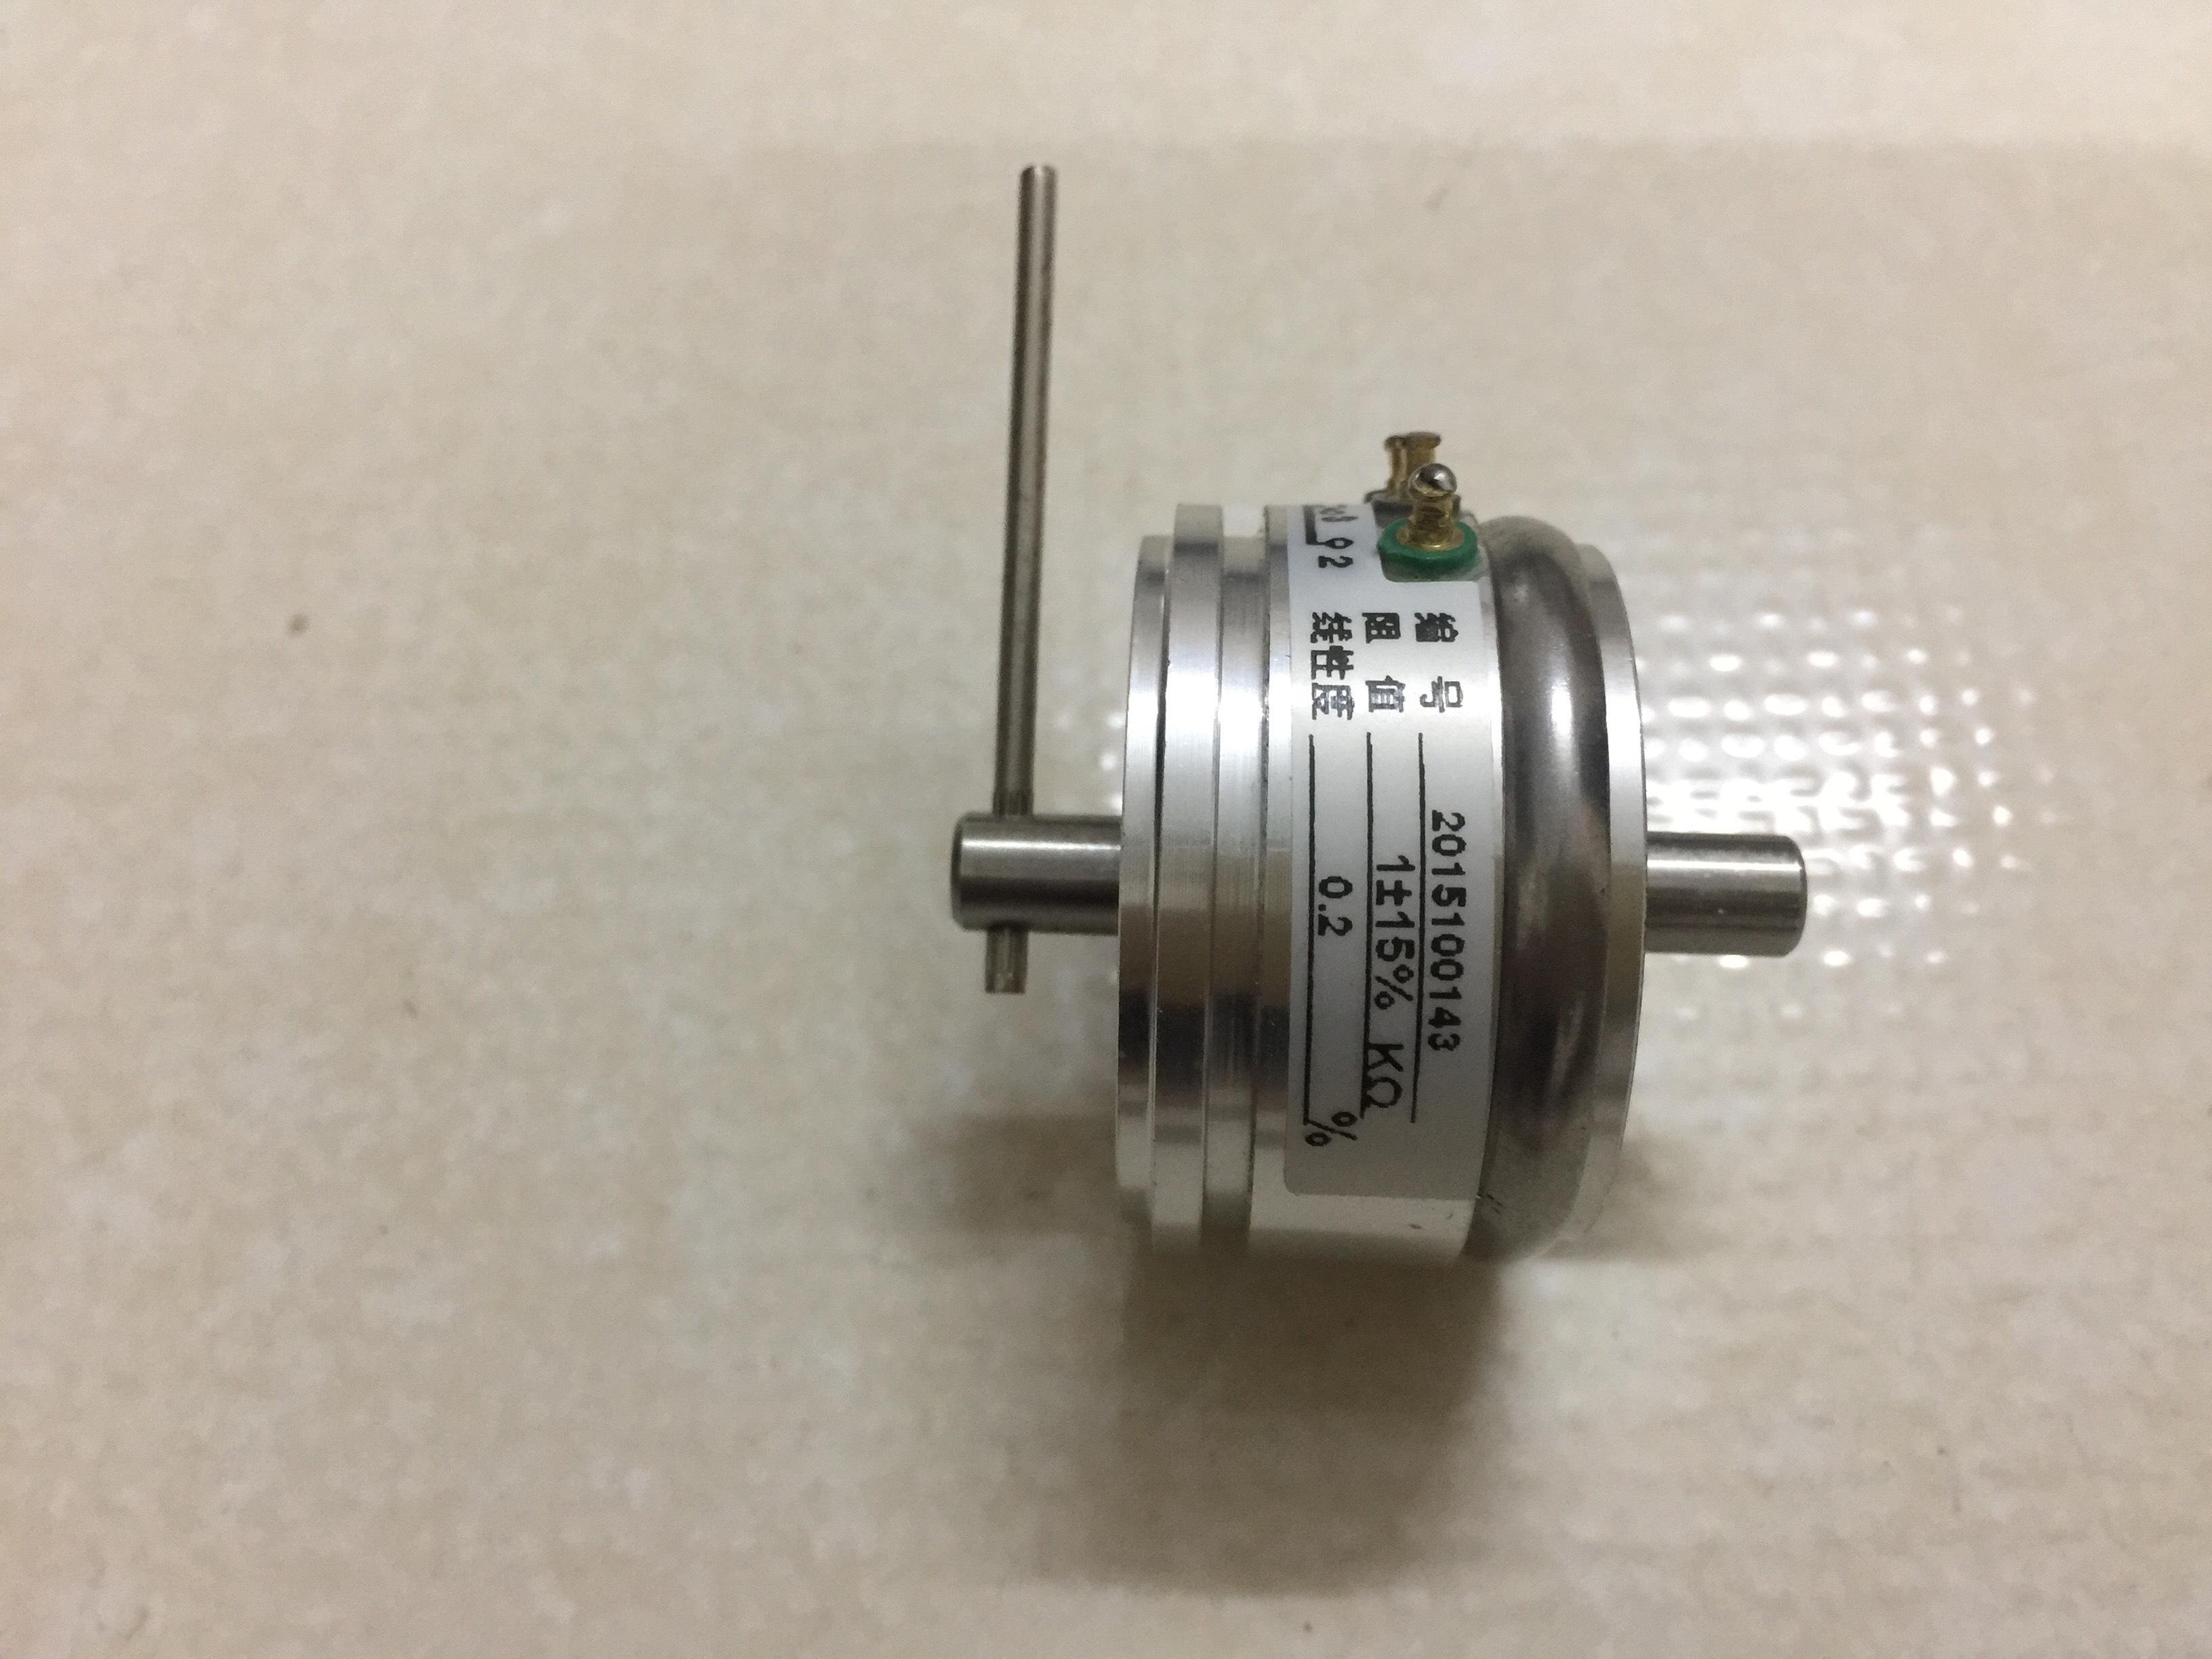 Biến trở 1K -VDD35S cho Actuator (Ready)